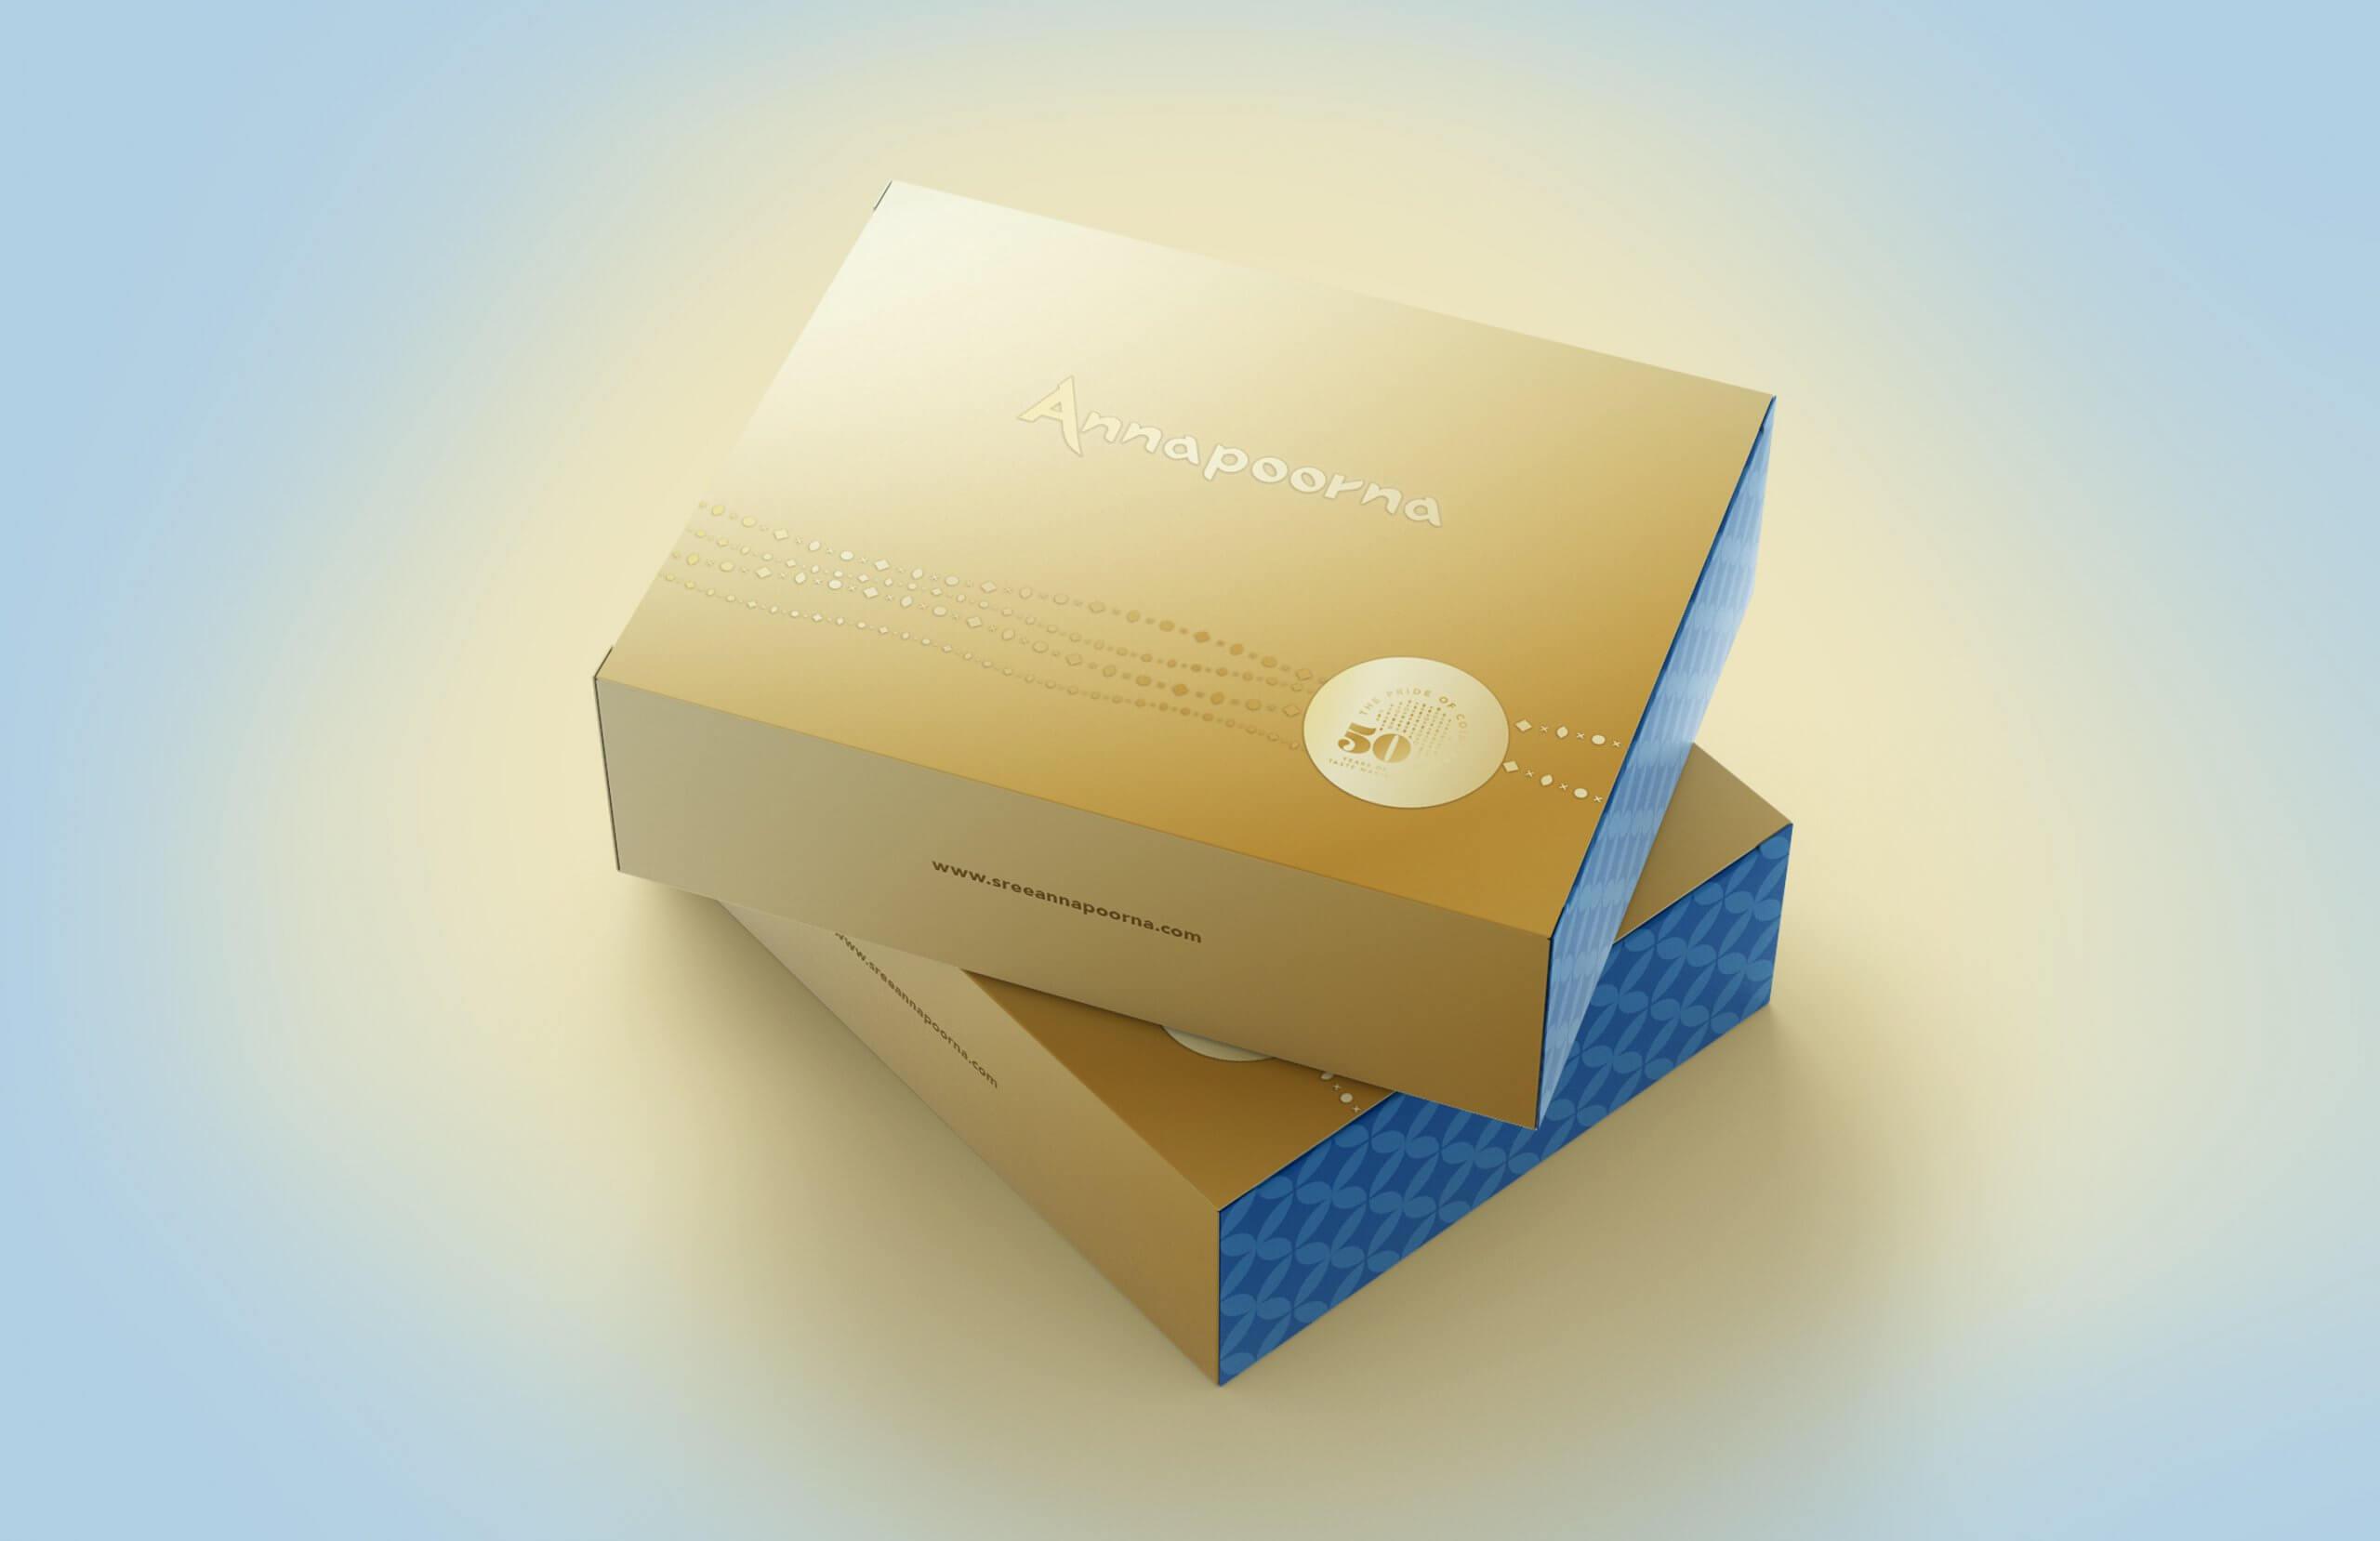 Annapoorna_Box_v08_2020